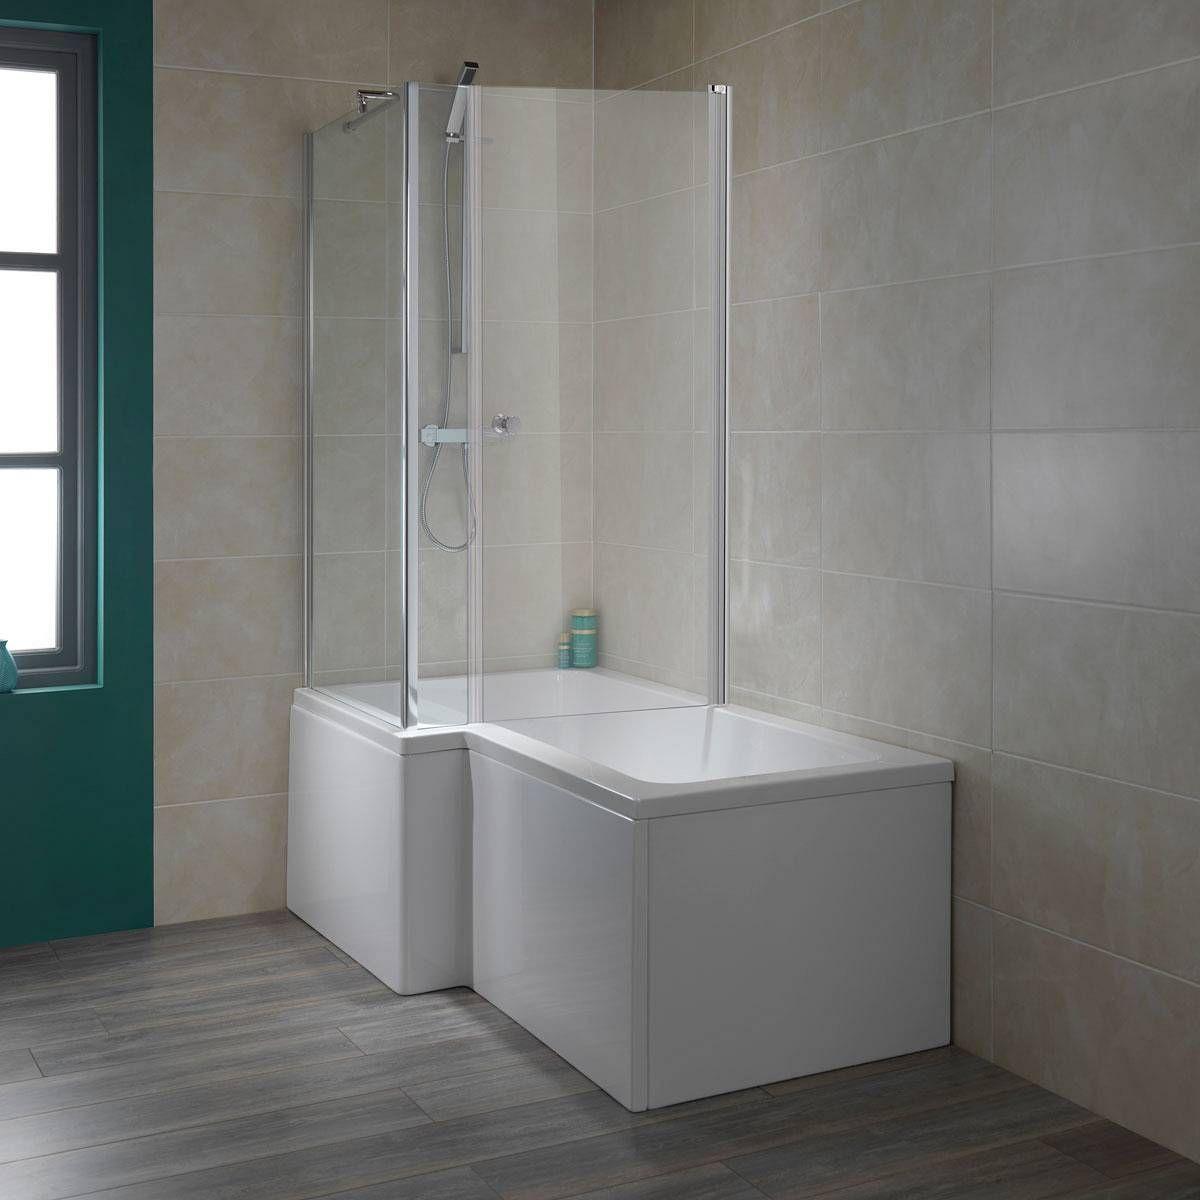 6mm Glass Door For Square Shaped Shower Bath | Bathroom | Pinterest ...